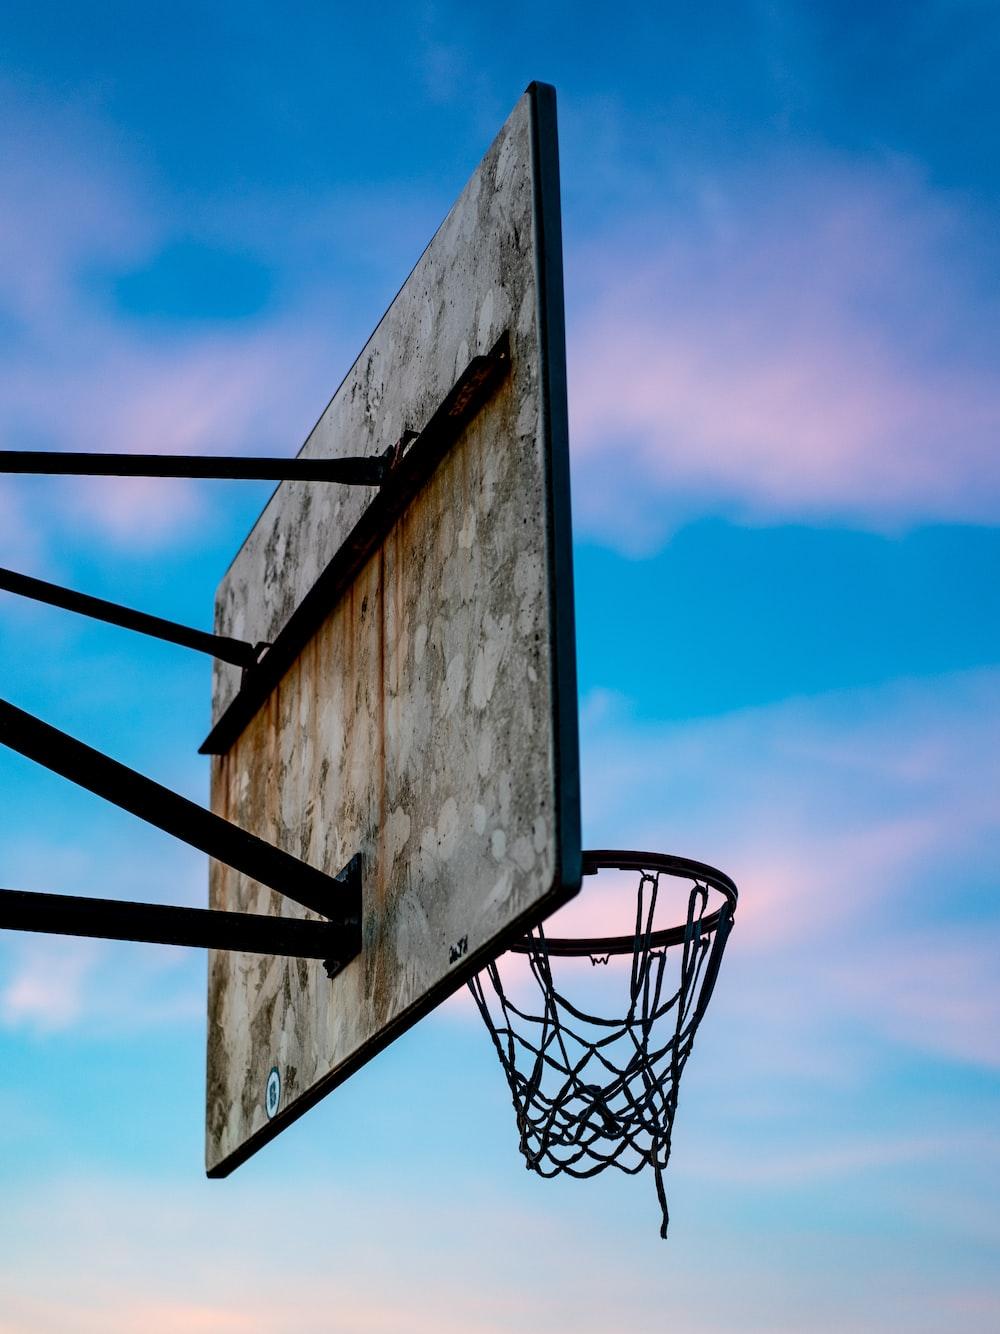 gray basketball hoop